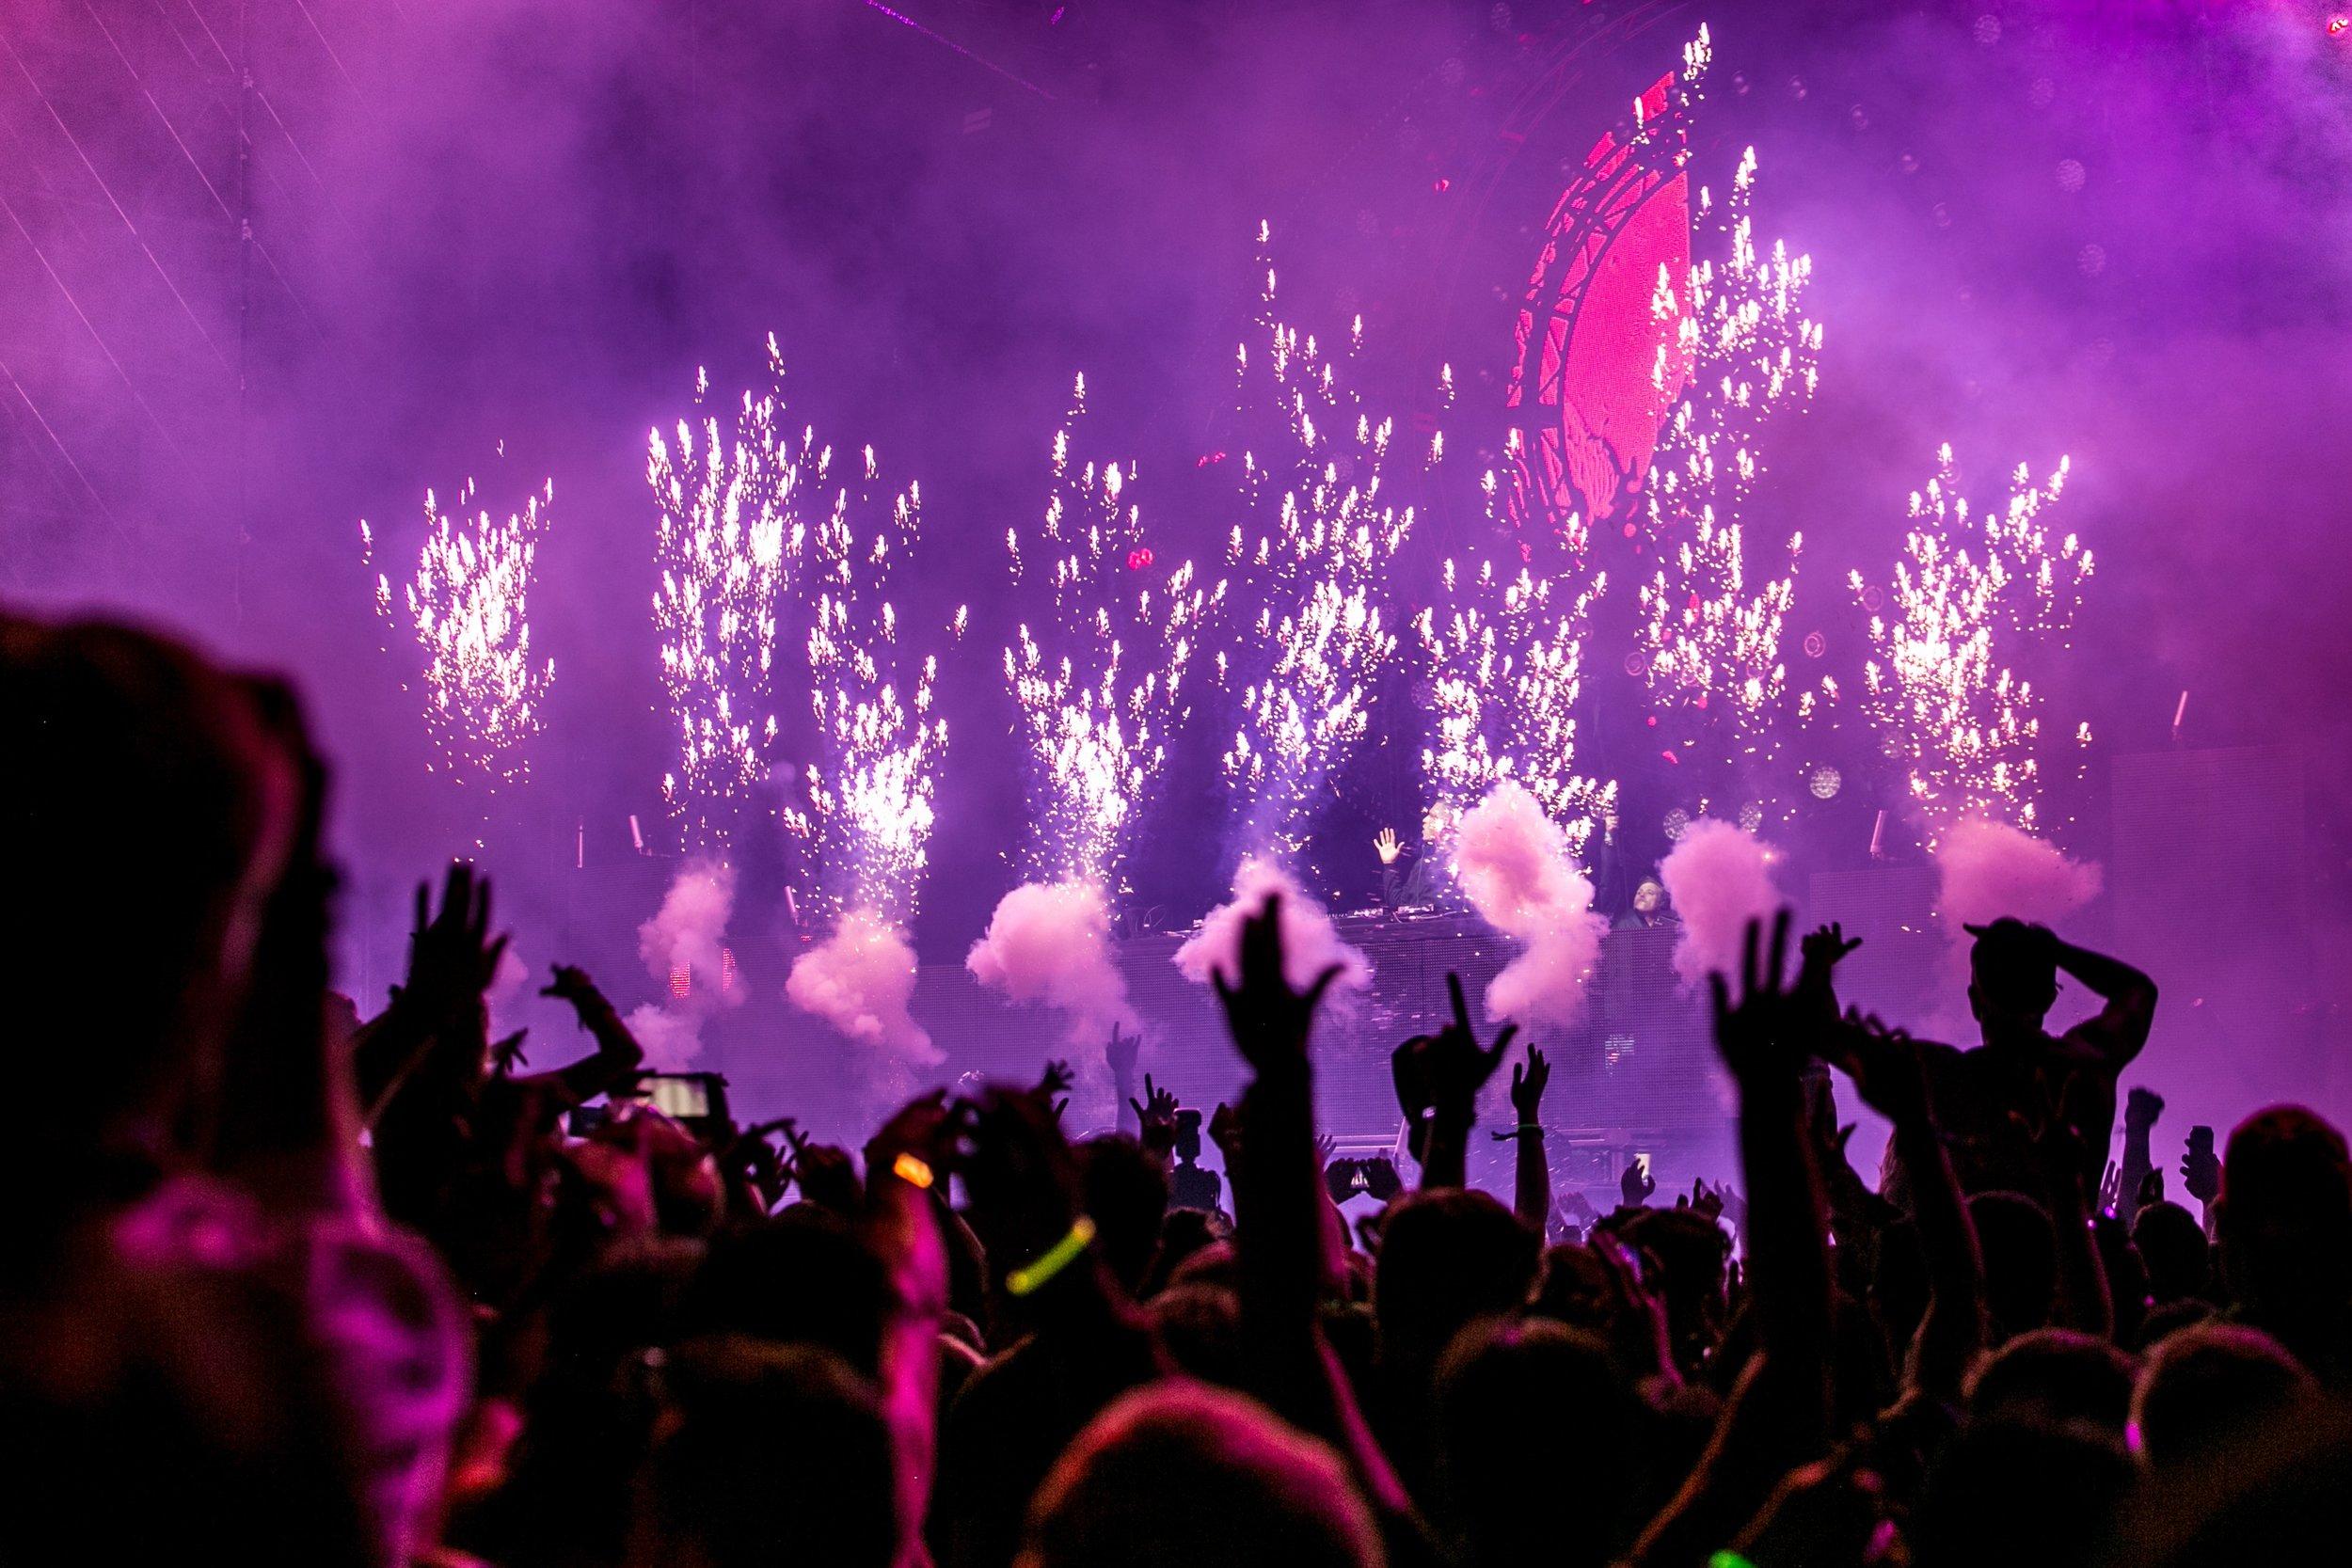 audience-band-celebration-1190298.jpg